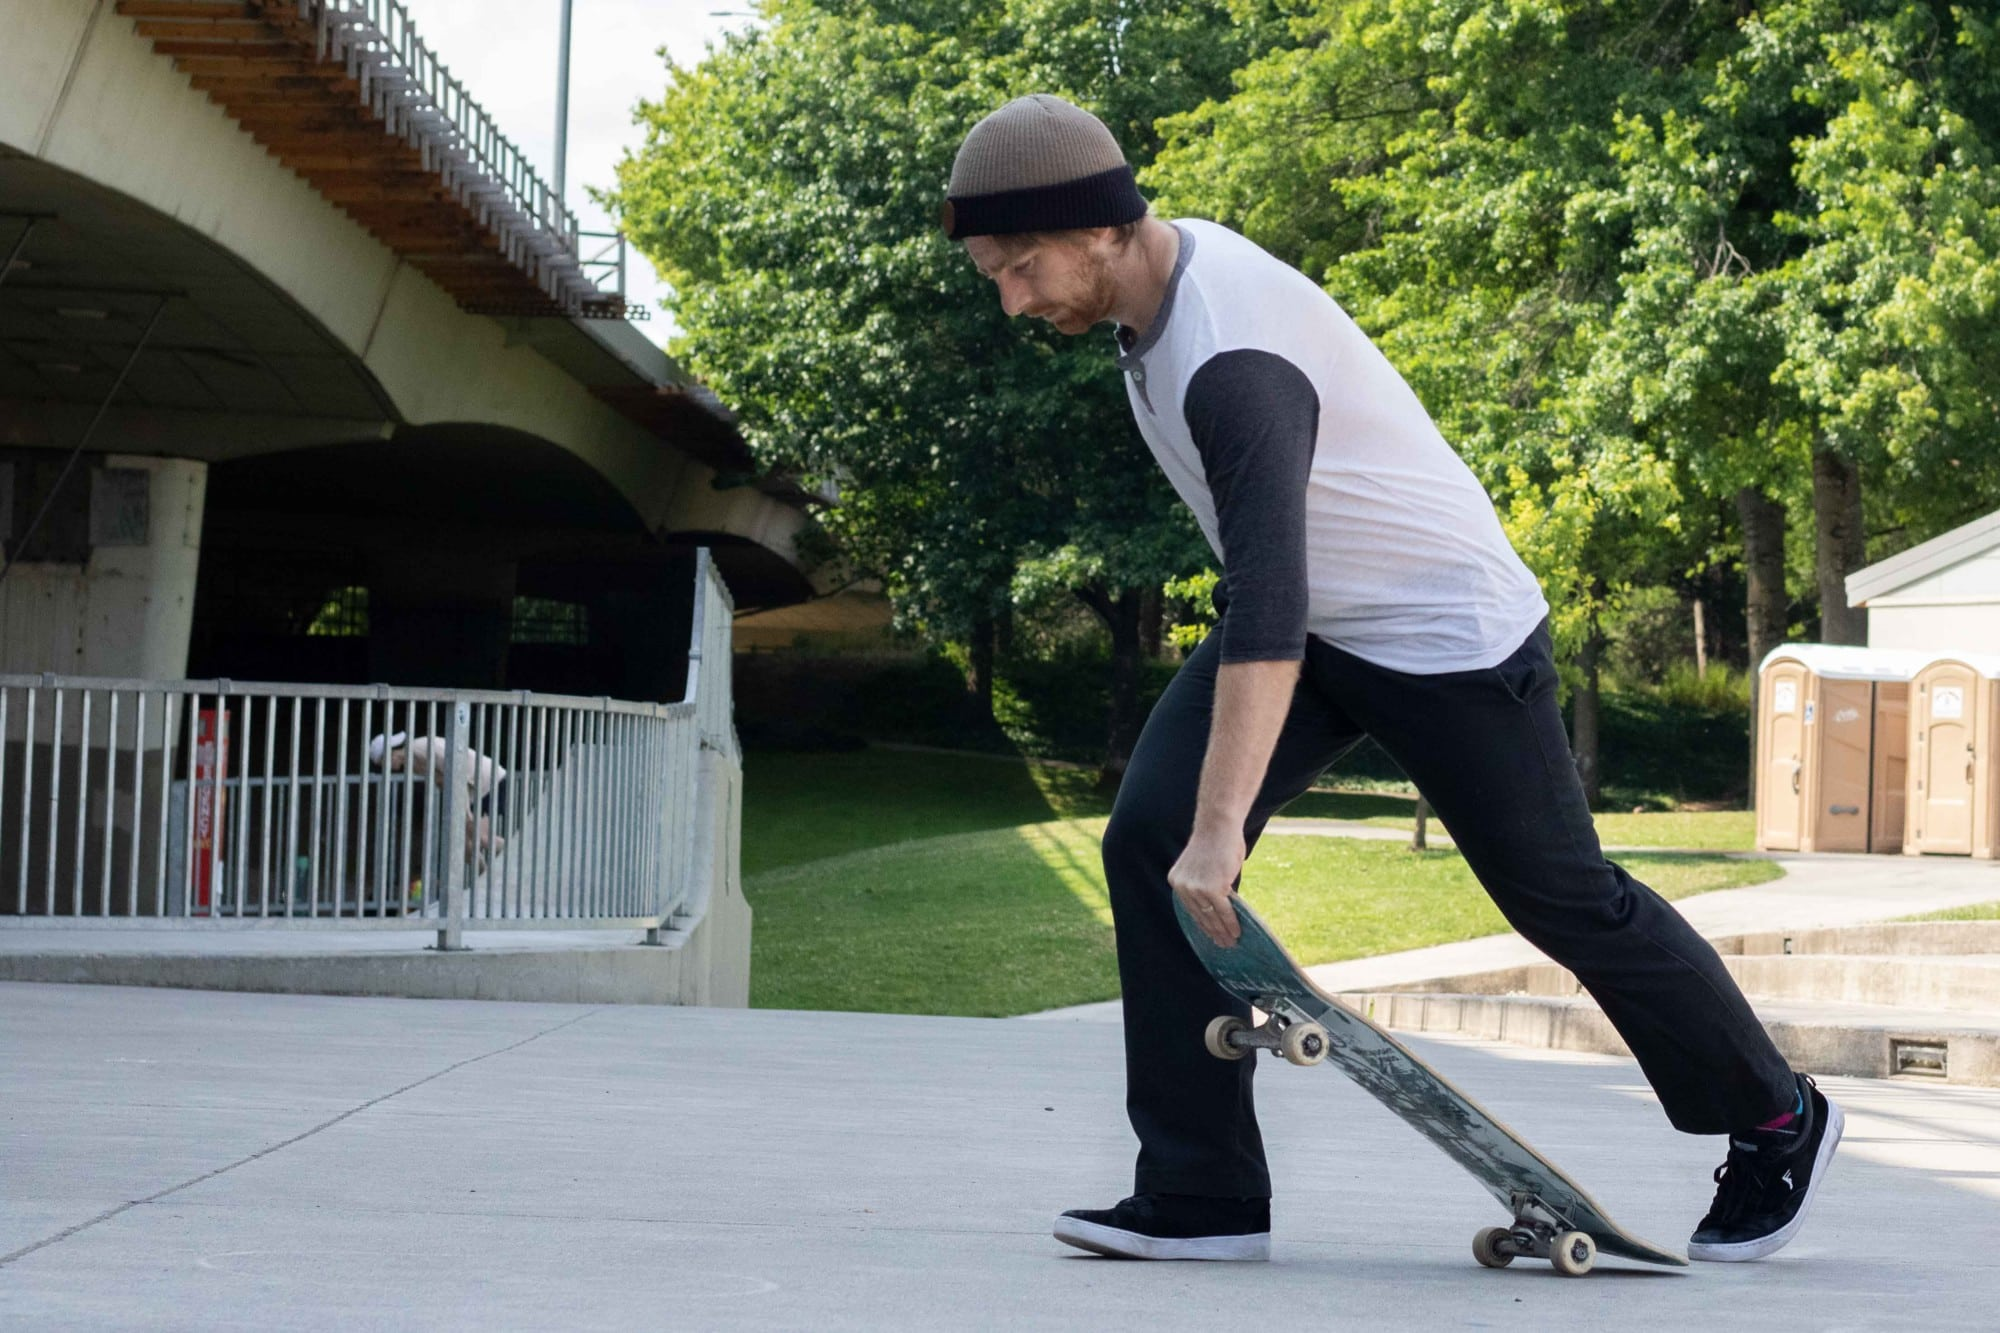 How To Skateboard Tactics